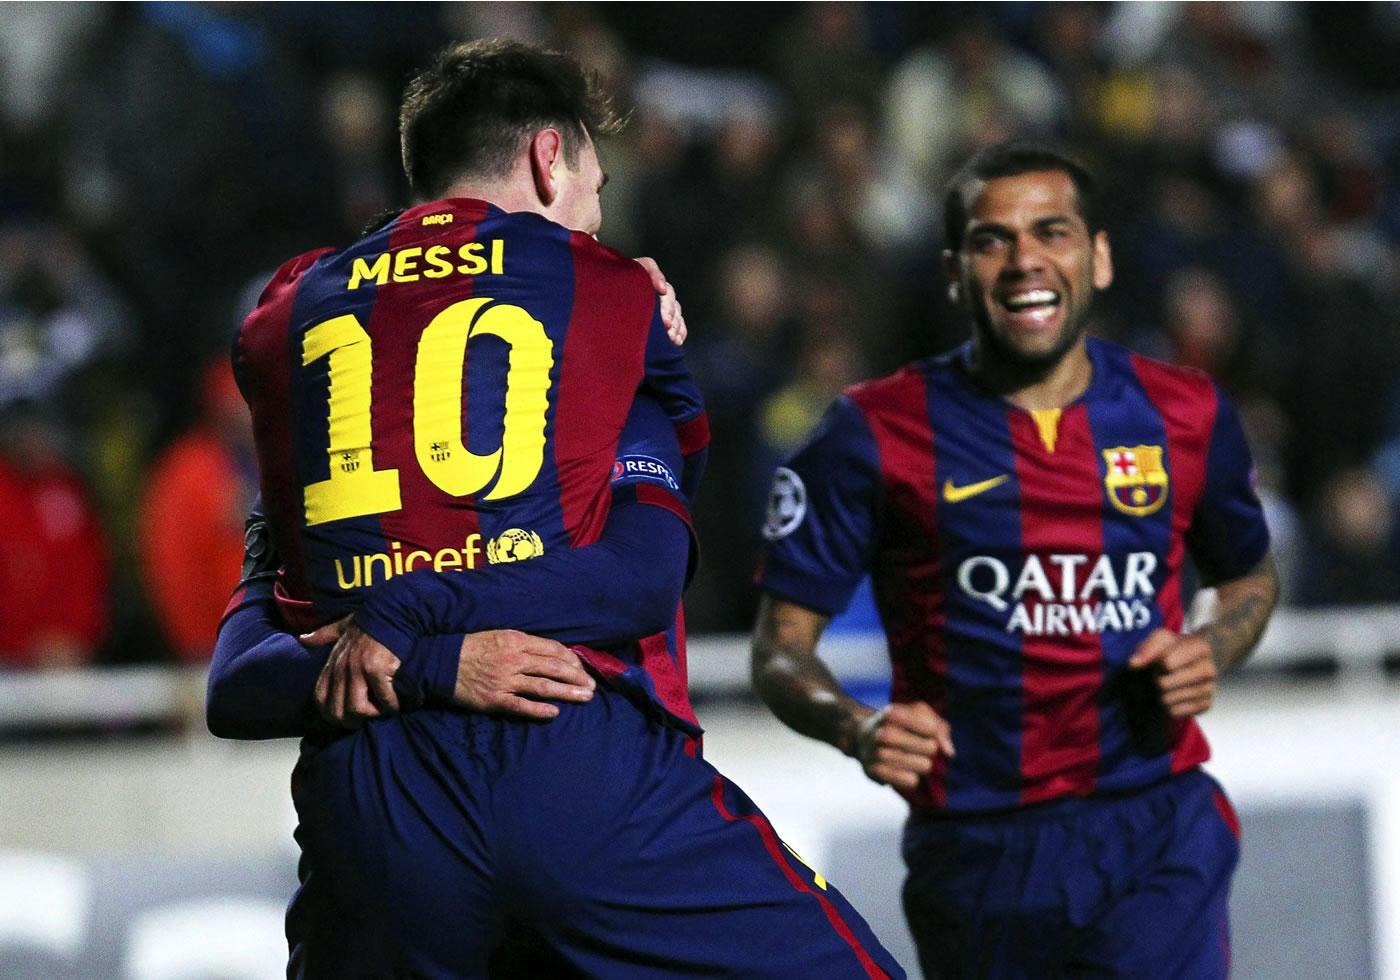 Apoel Nicosia 0-4 Barcelona (Champions League)